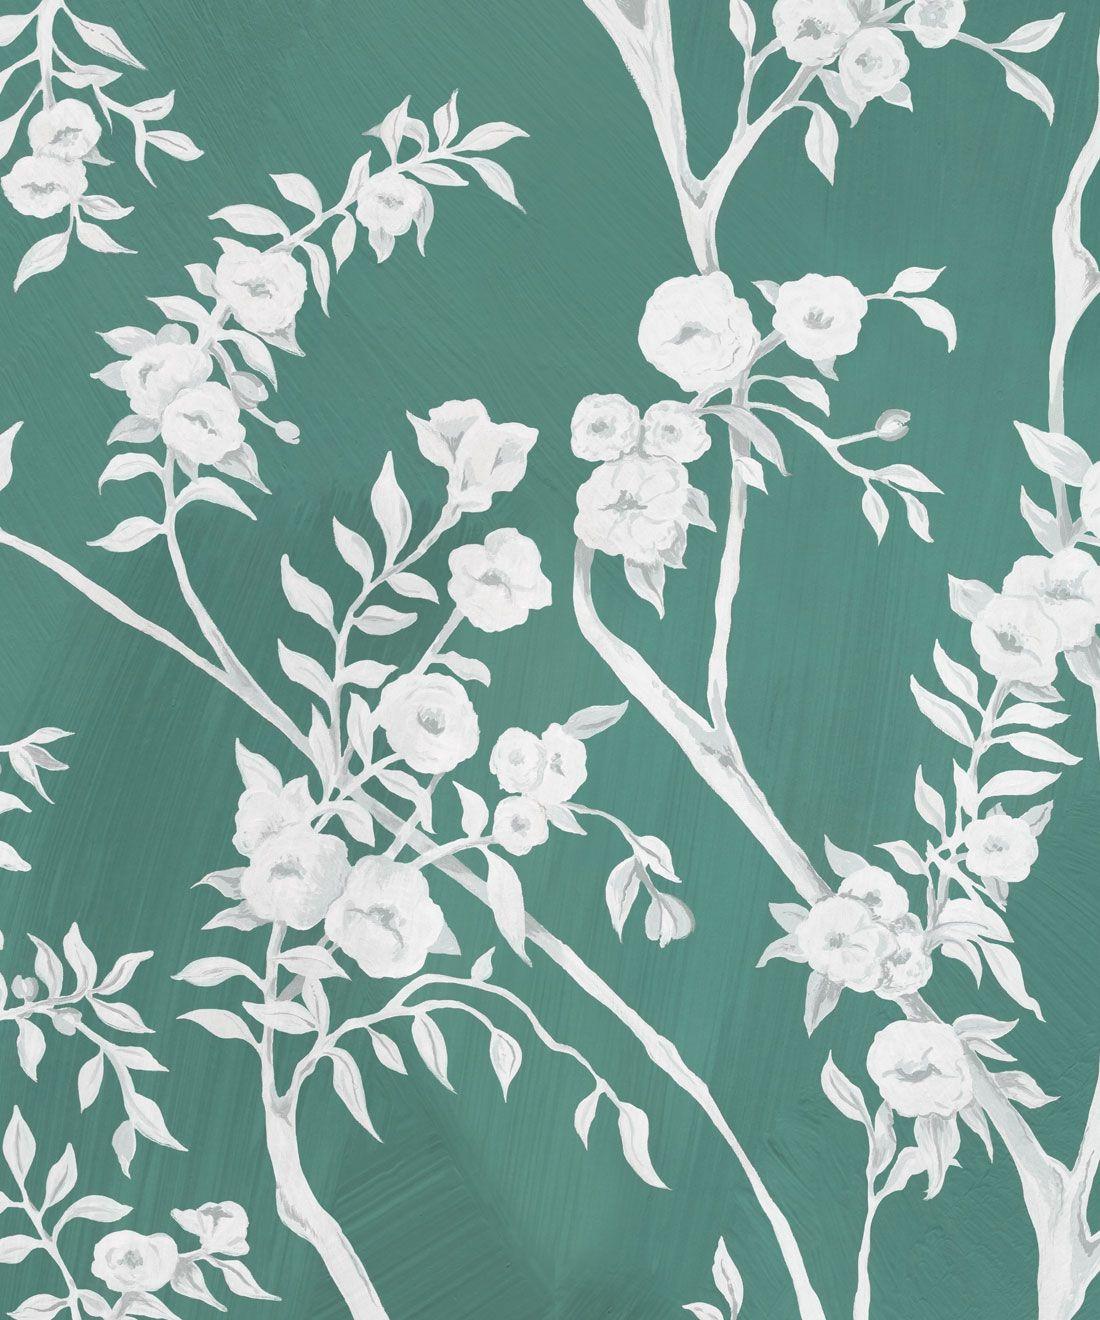 Blooming Joy • Chinoiserie Wallpaper by Danica Andler • Jade Swatch